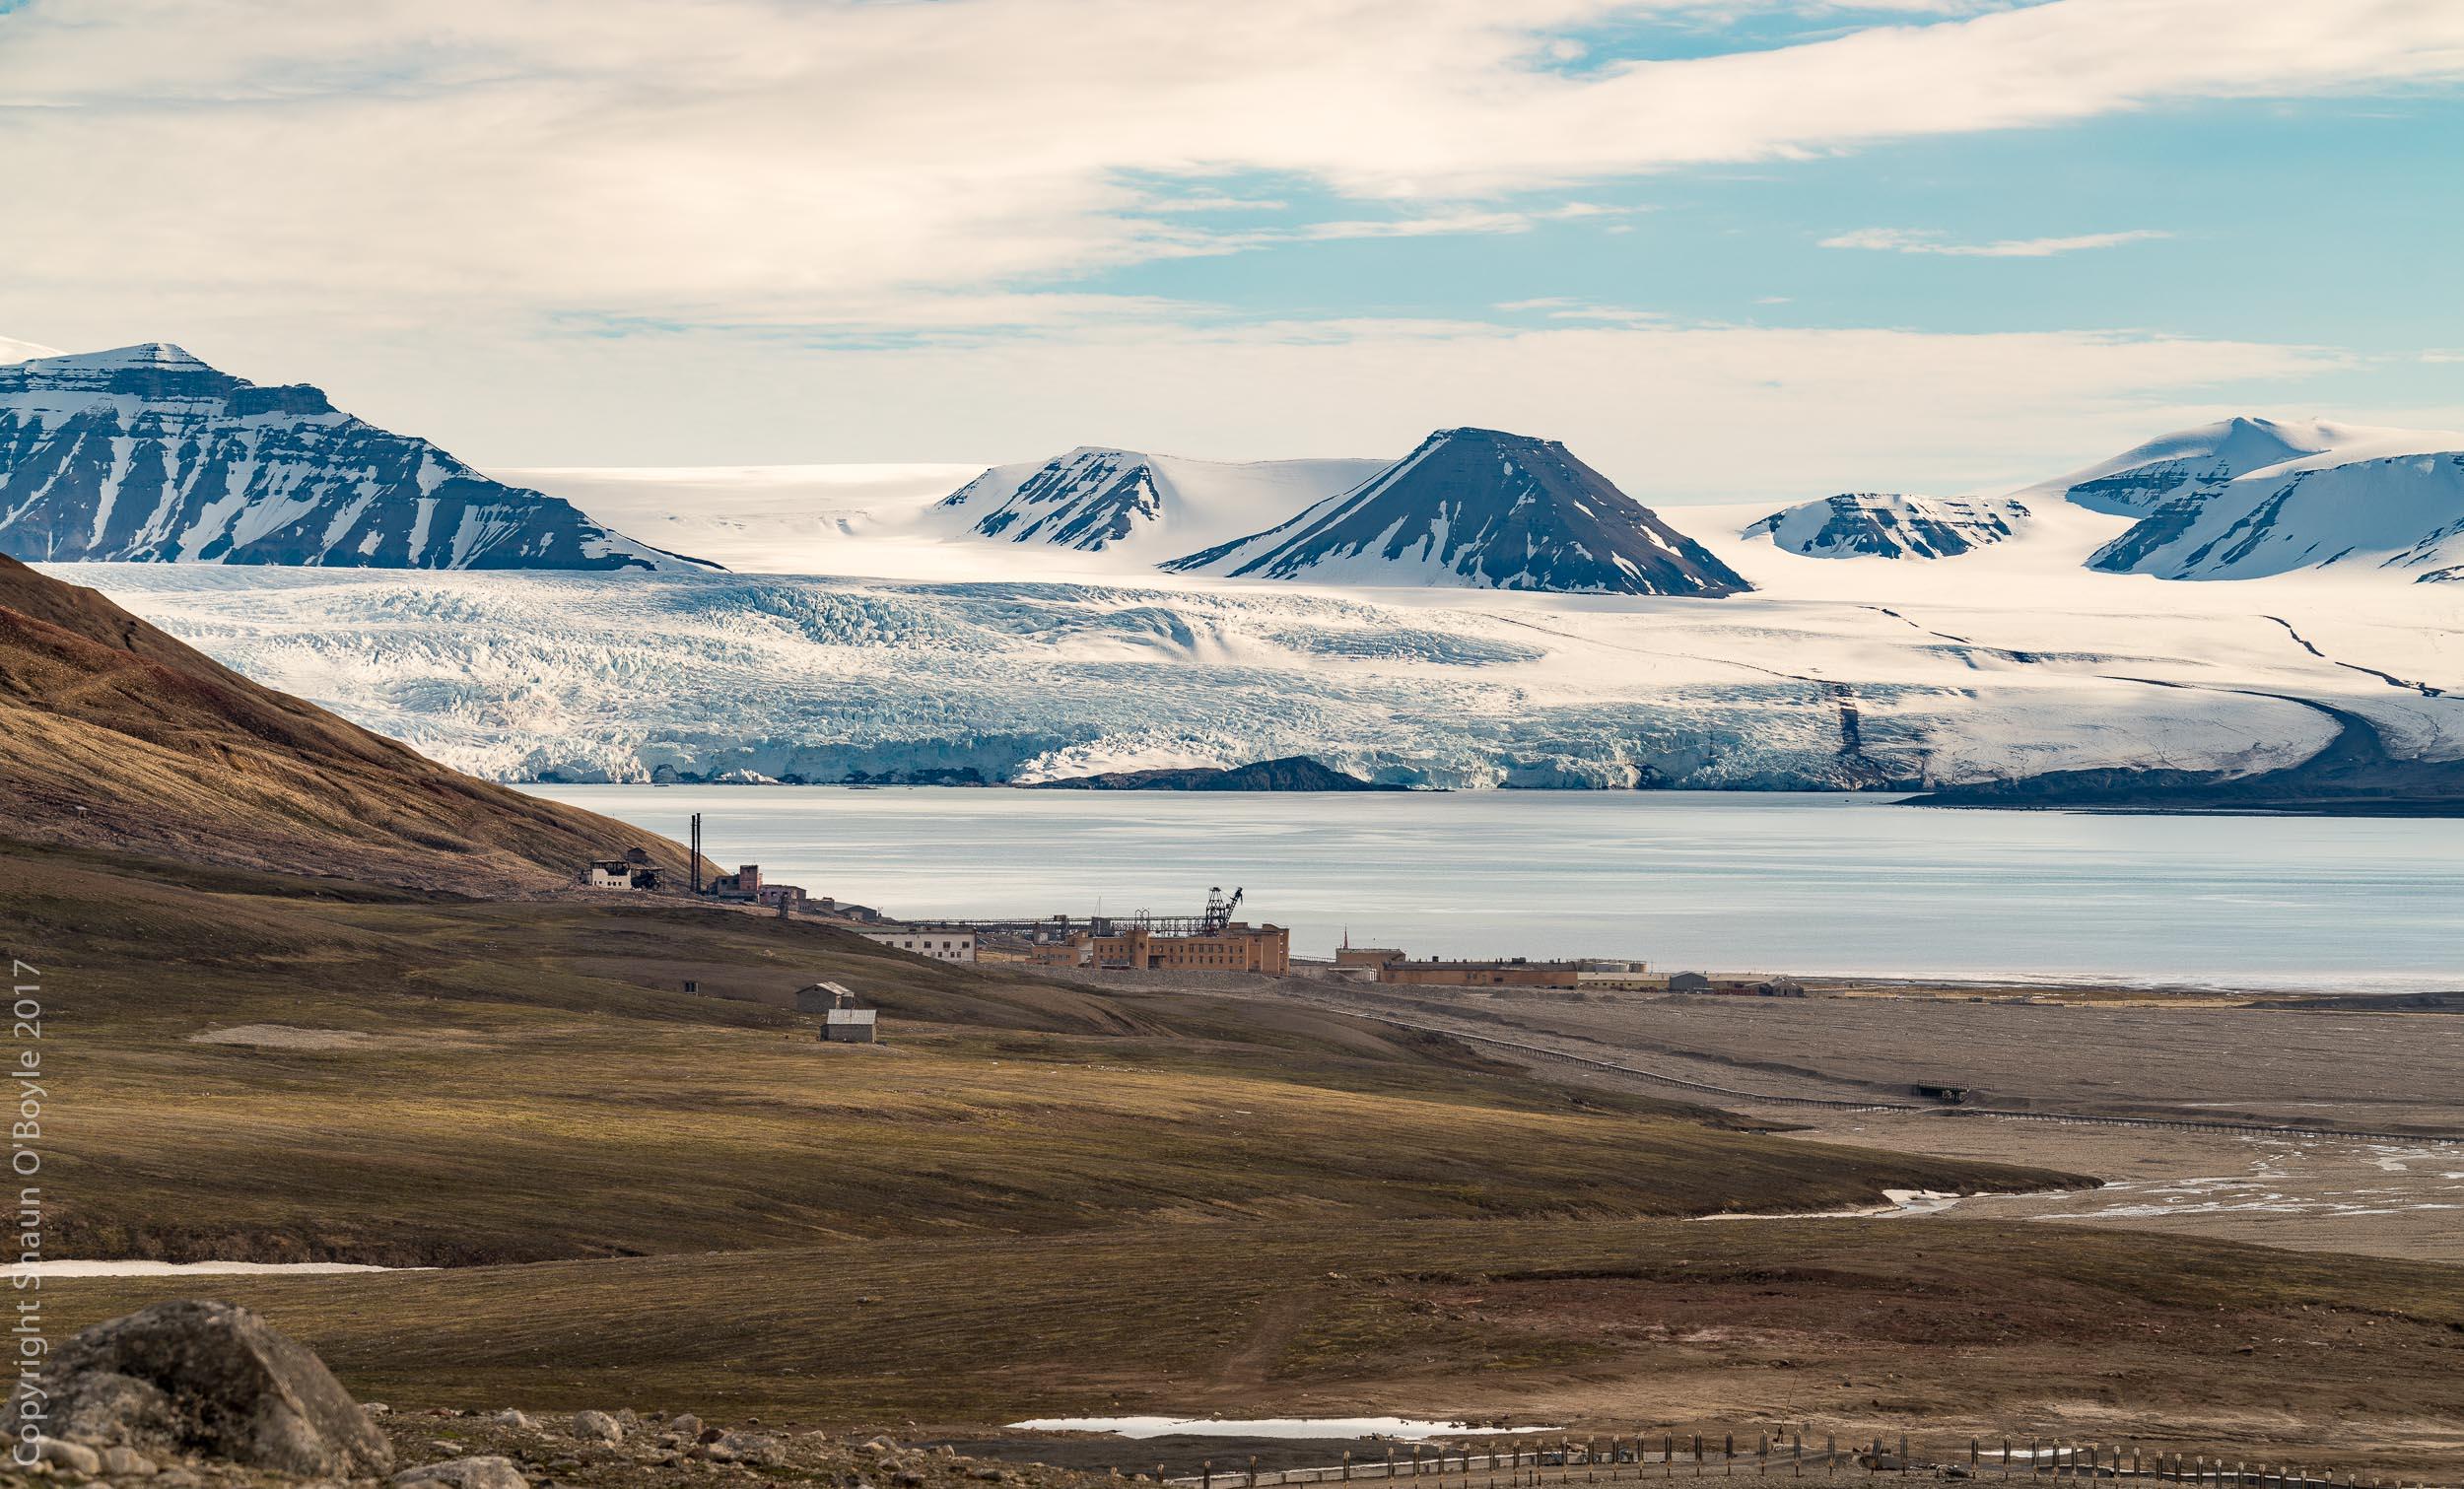 Pyramiden, Isfjorden (Ice Fjord) and Nordenskioldbreen beyond. Breen is Norwegian for glacier.